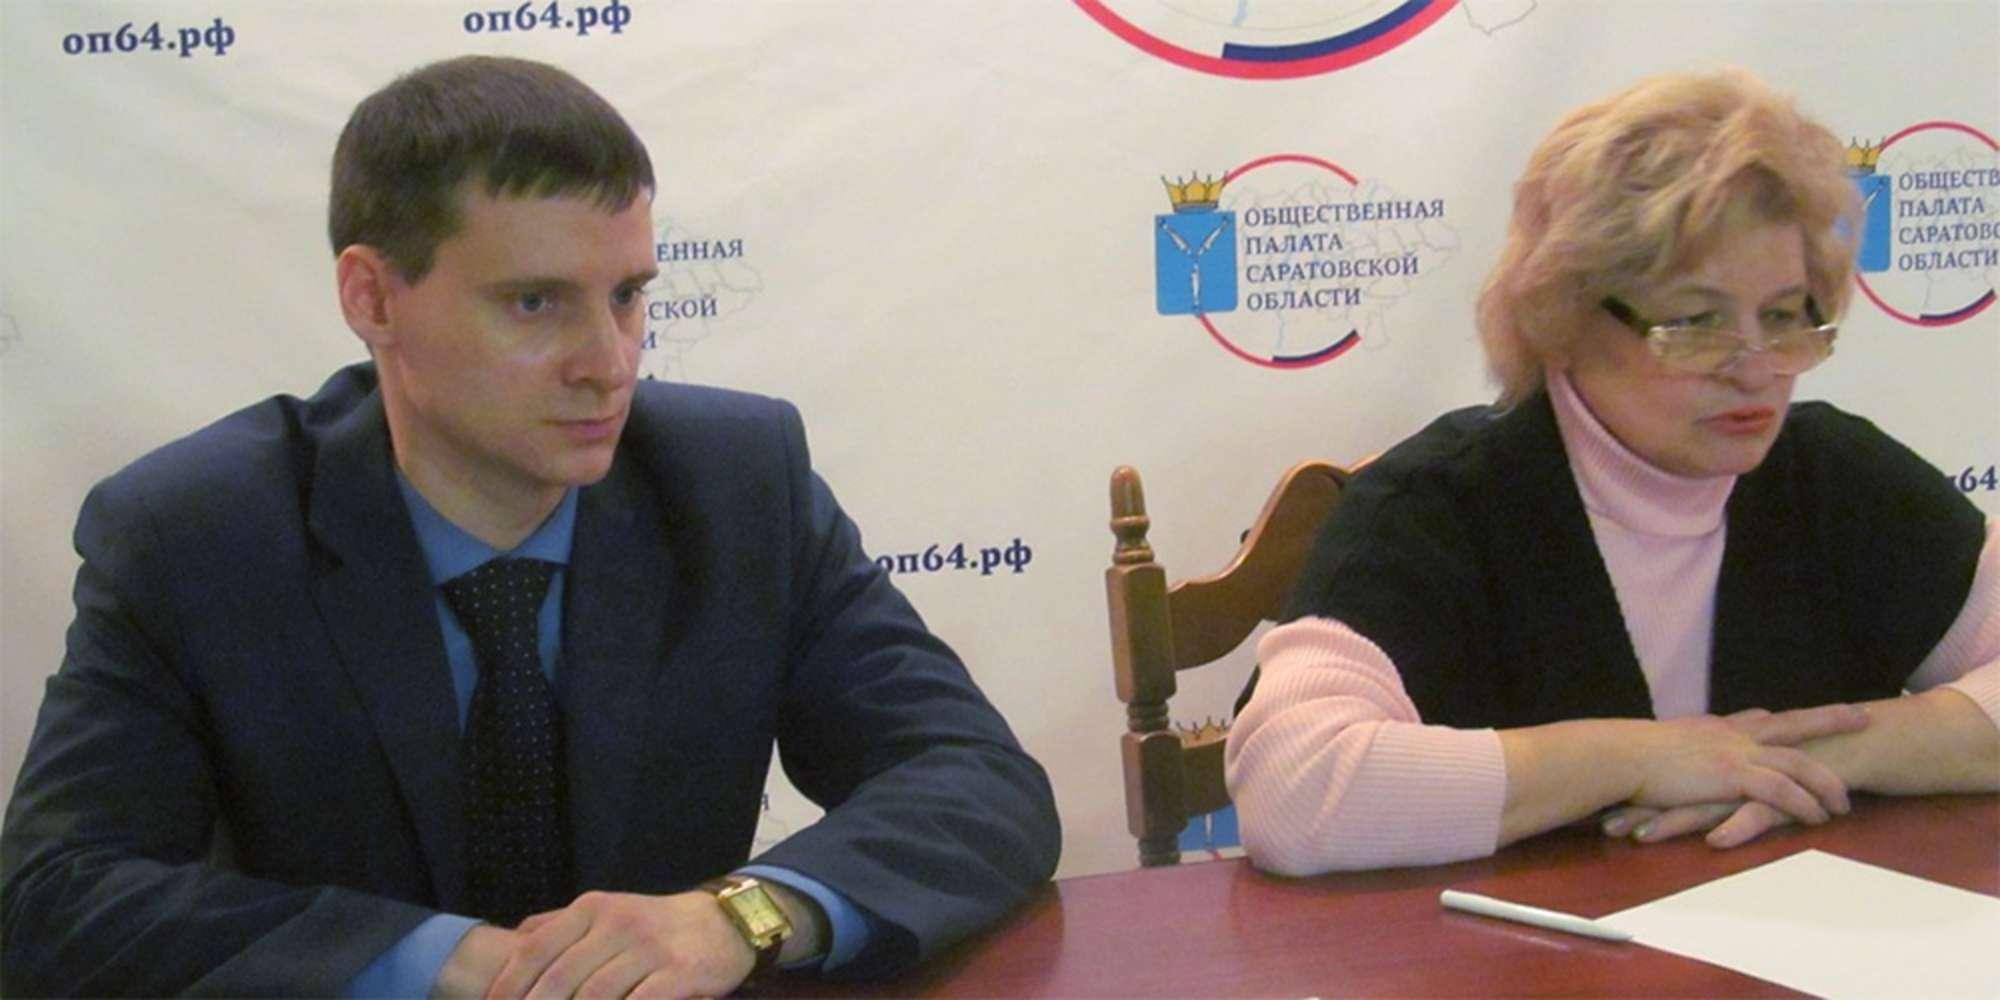 Слева — Зеленов, справа — Королькова. Фото — оп64.рф